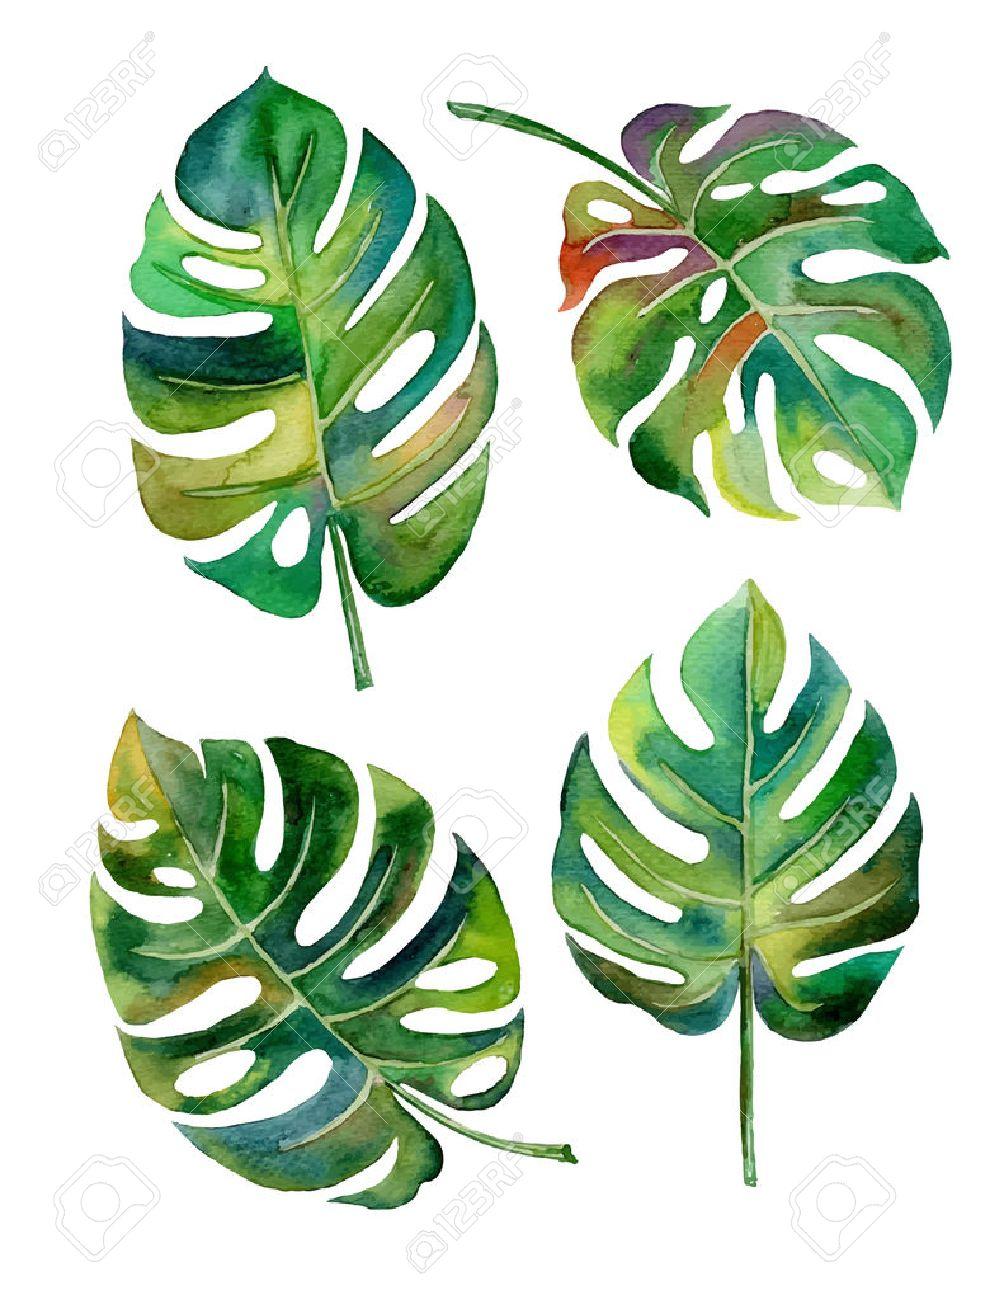 hand draw Split leaf style design for the label, covertexture paper illustration EPS10 - 42835129